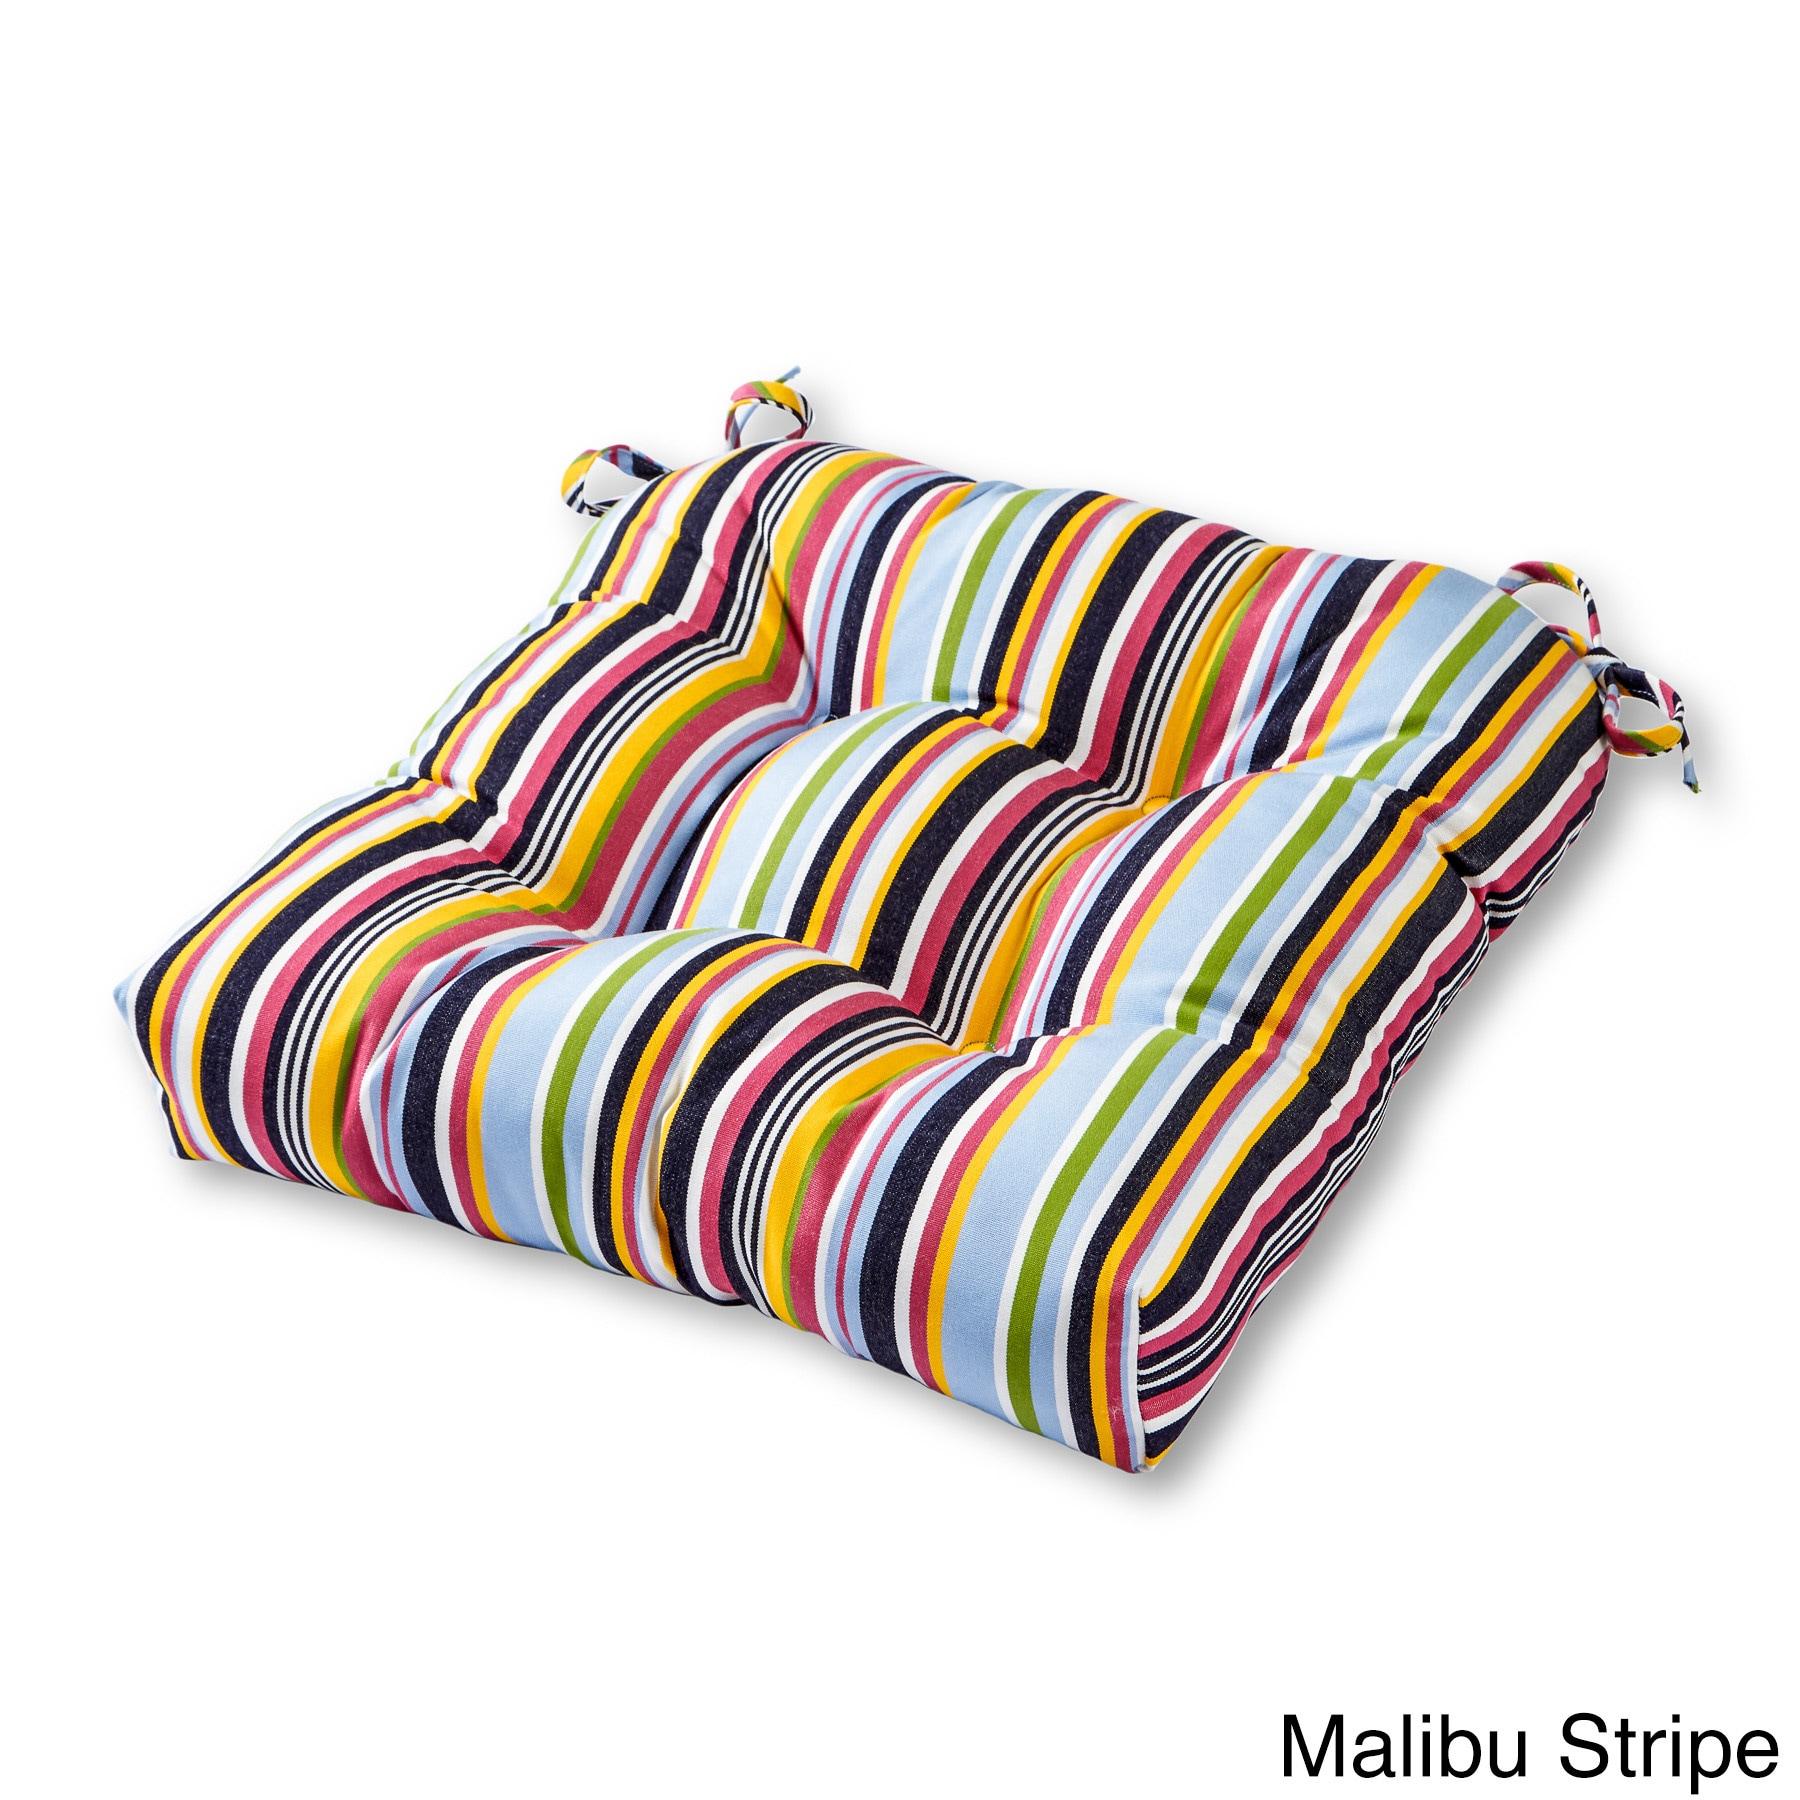 Outdoor Stripe Sunbrella 20 inch Chair Cushion Free Shipping